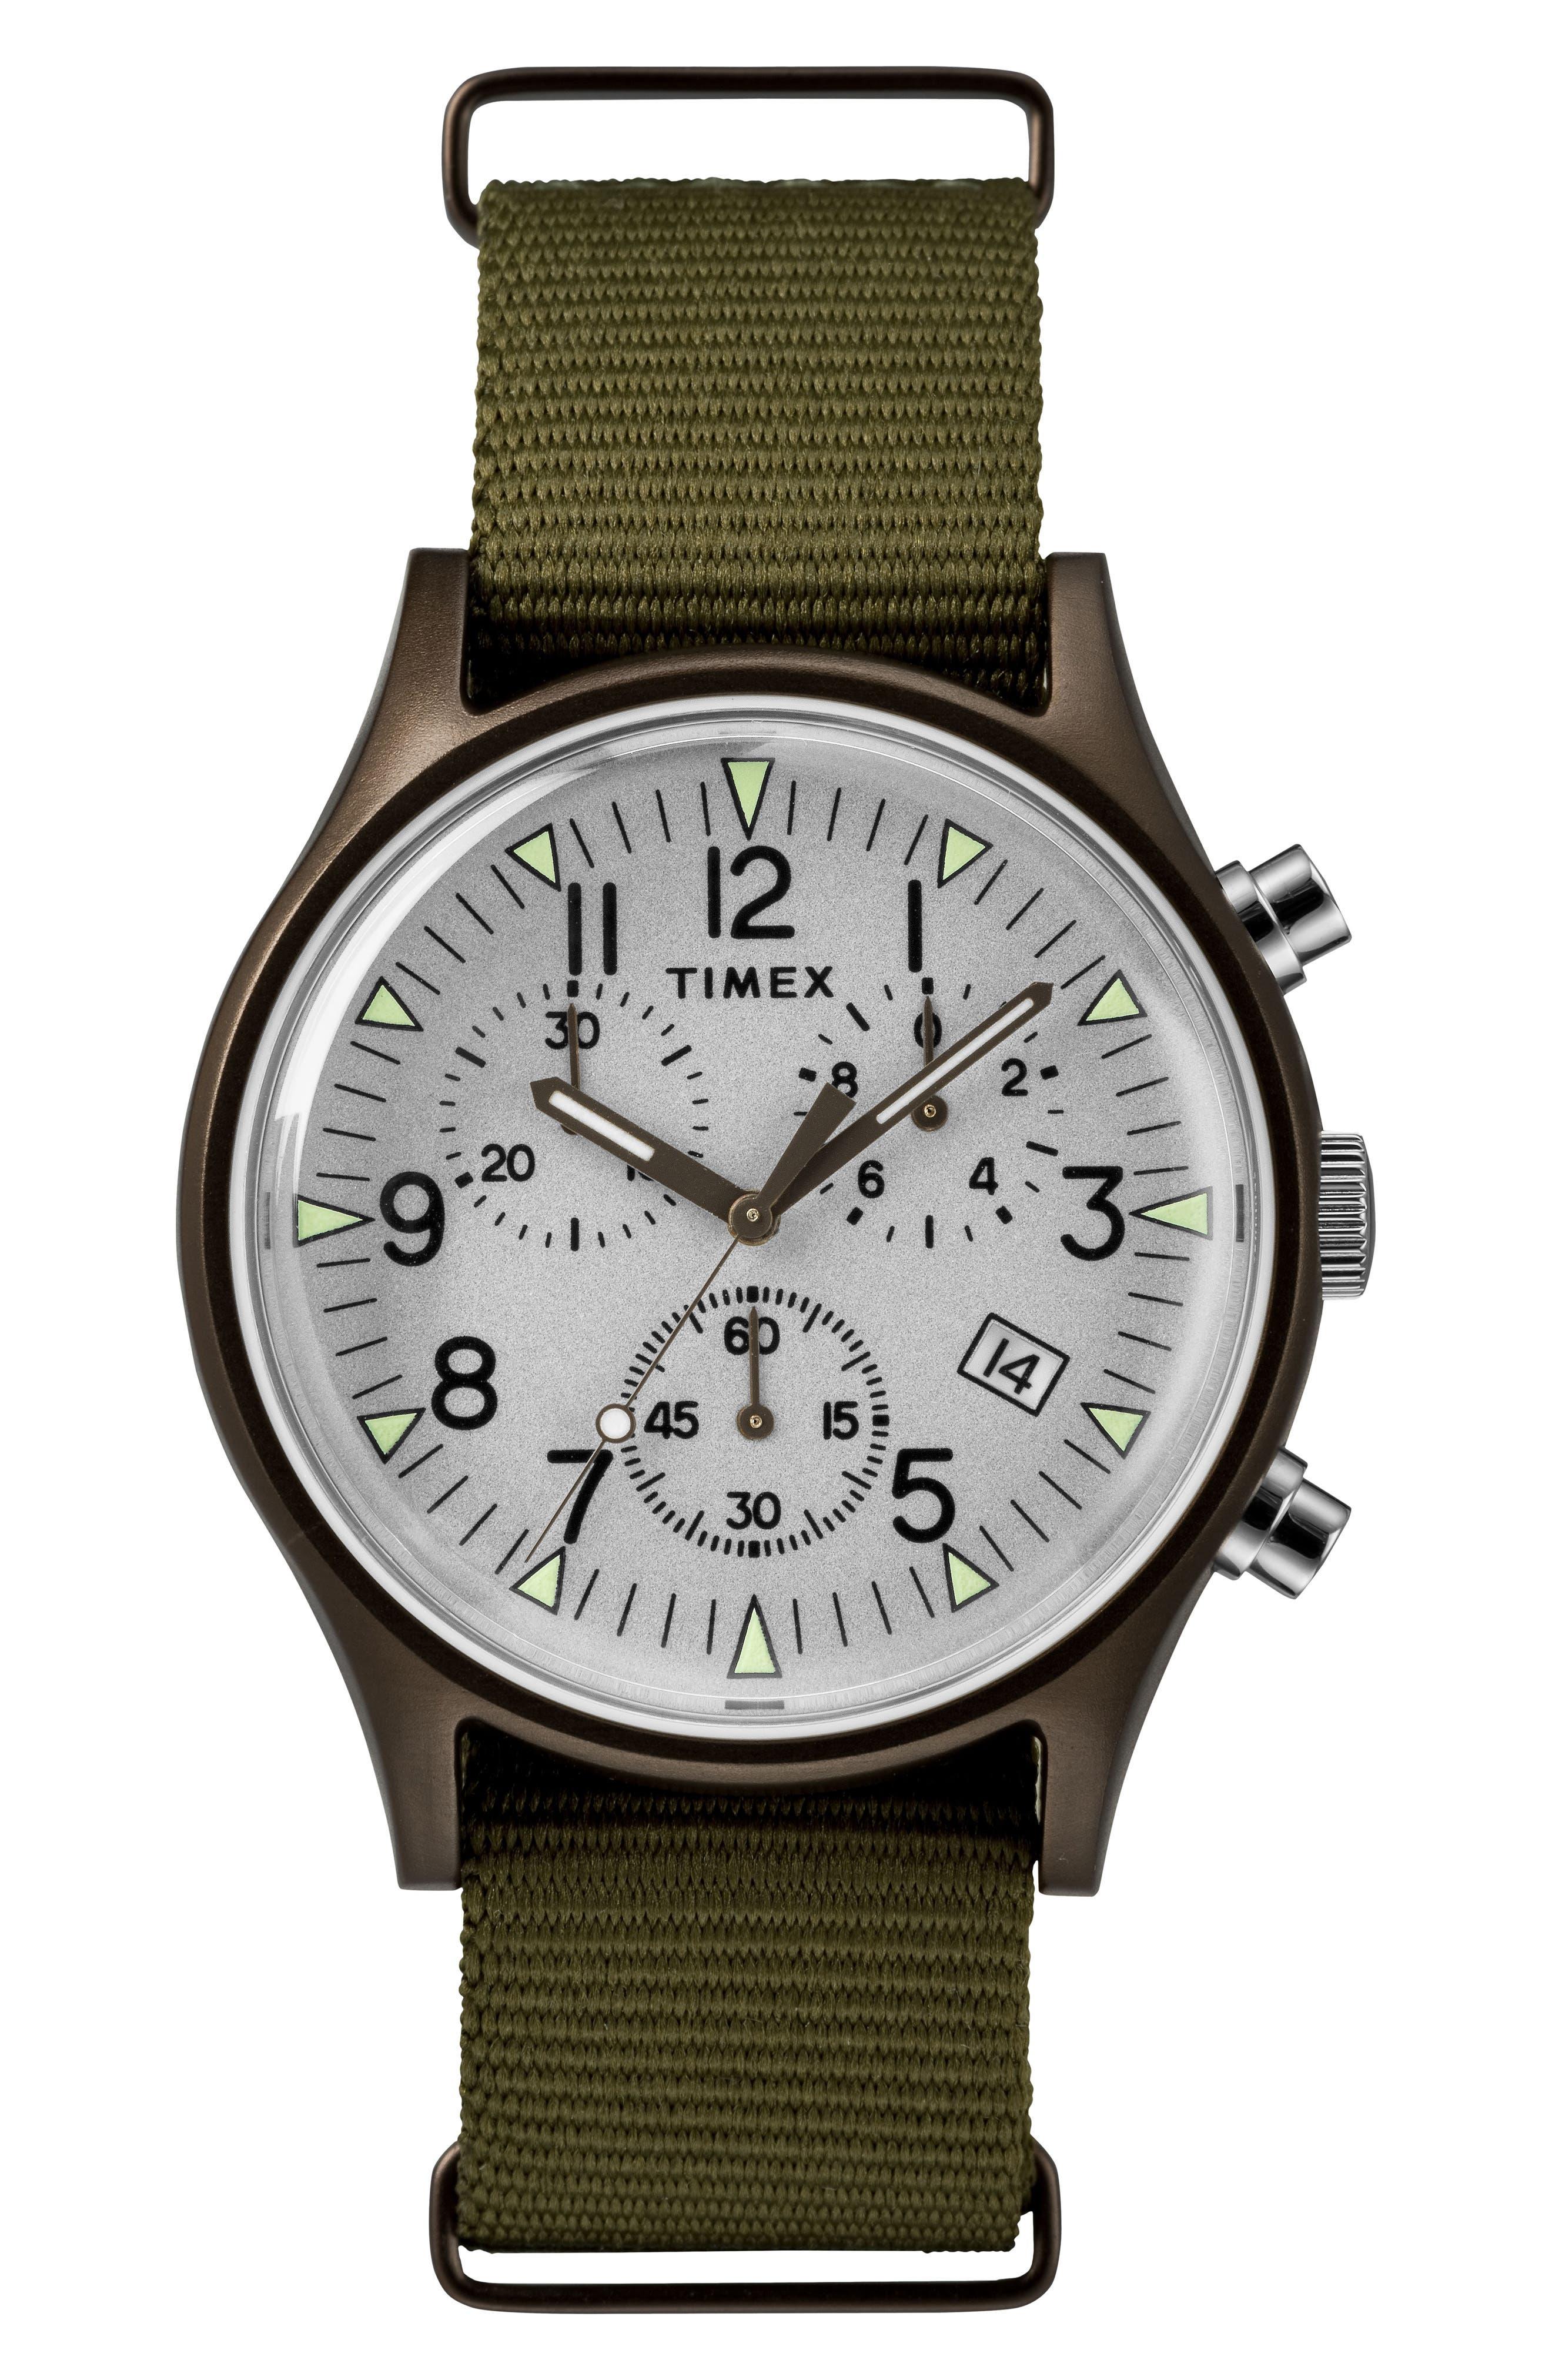 MK1 Chronograph Nylon Strap Watch,                             Main thumbnail 1, color,                             OLIVE/ SILVER/ GREY